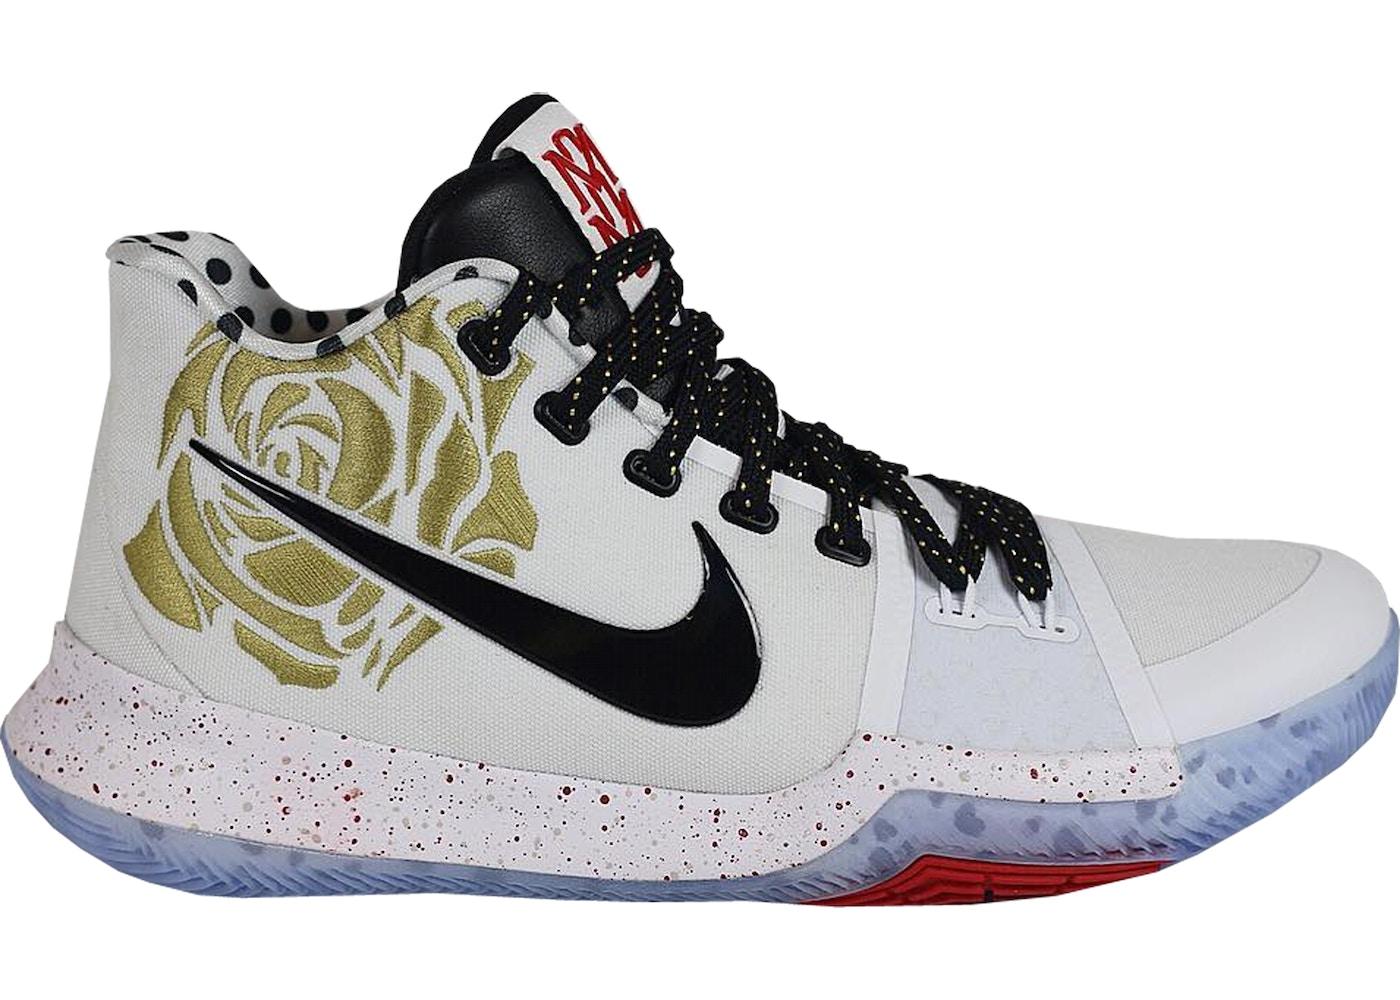 wholesale dealer 0e913 fae2a Nike Basketball Kyrie Shoes - Last Sale